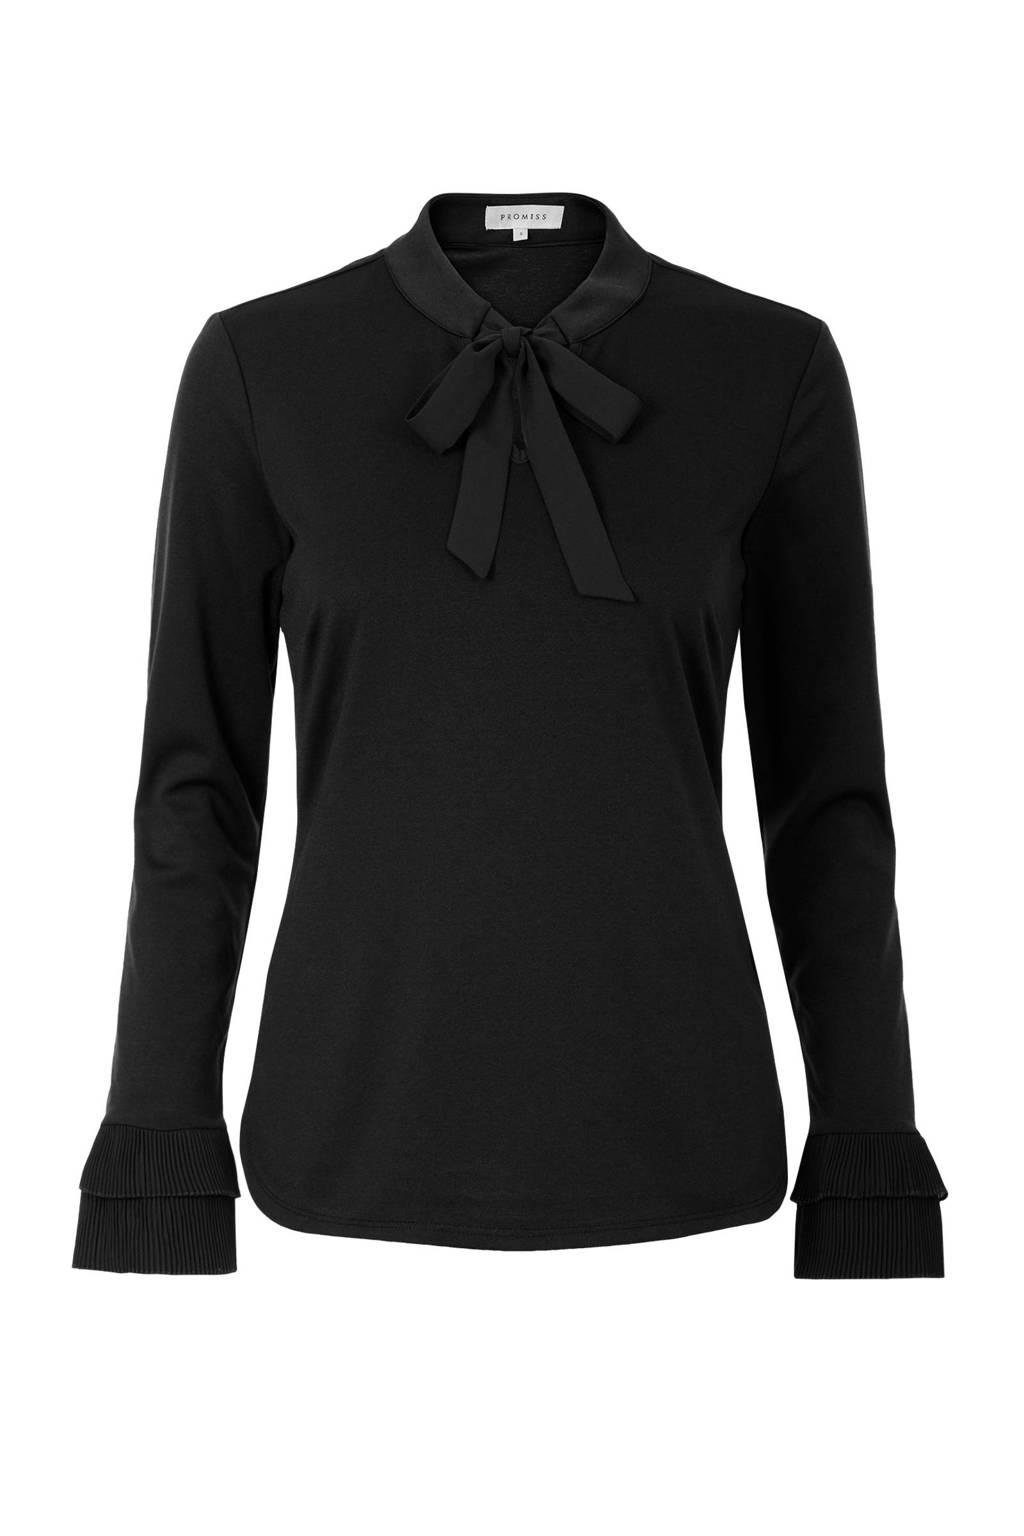 Promiss top met strikdetail zwart, Zwart